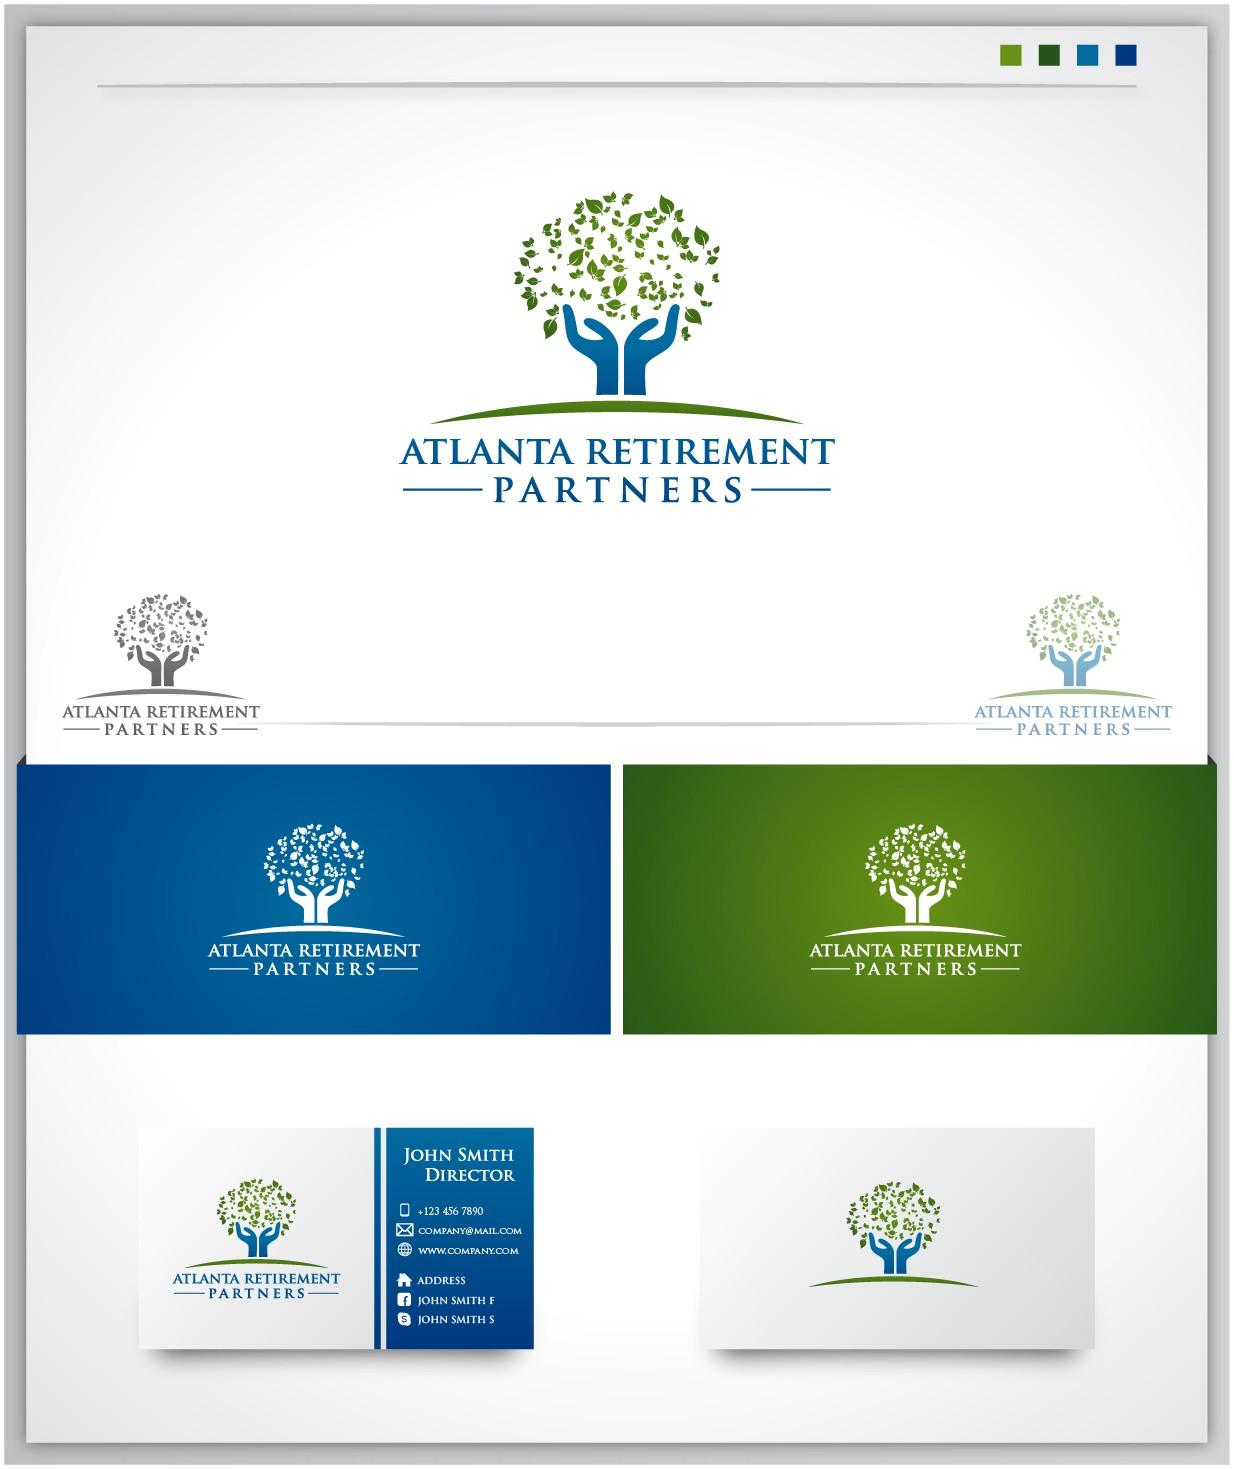 Create the next logo for Atlanta Retirement Partners